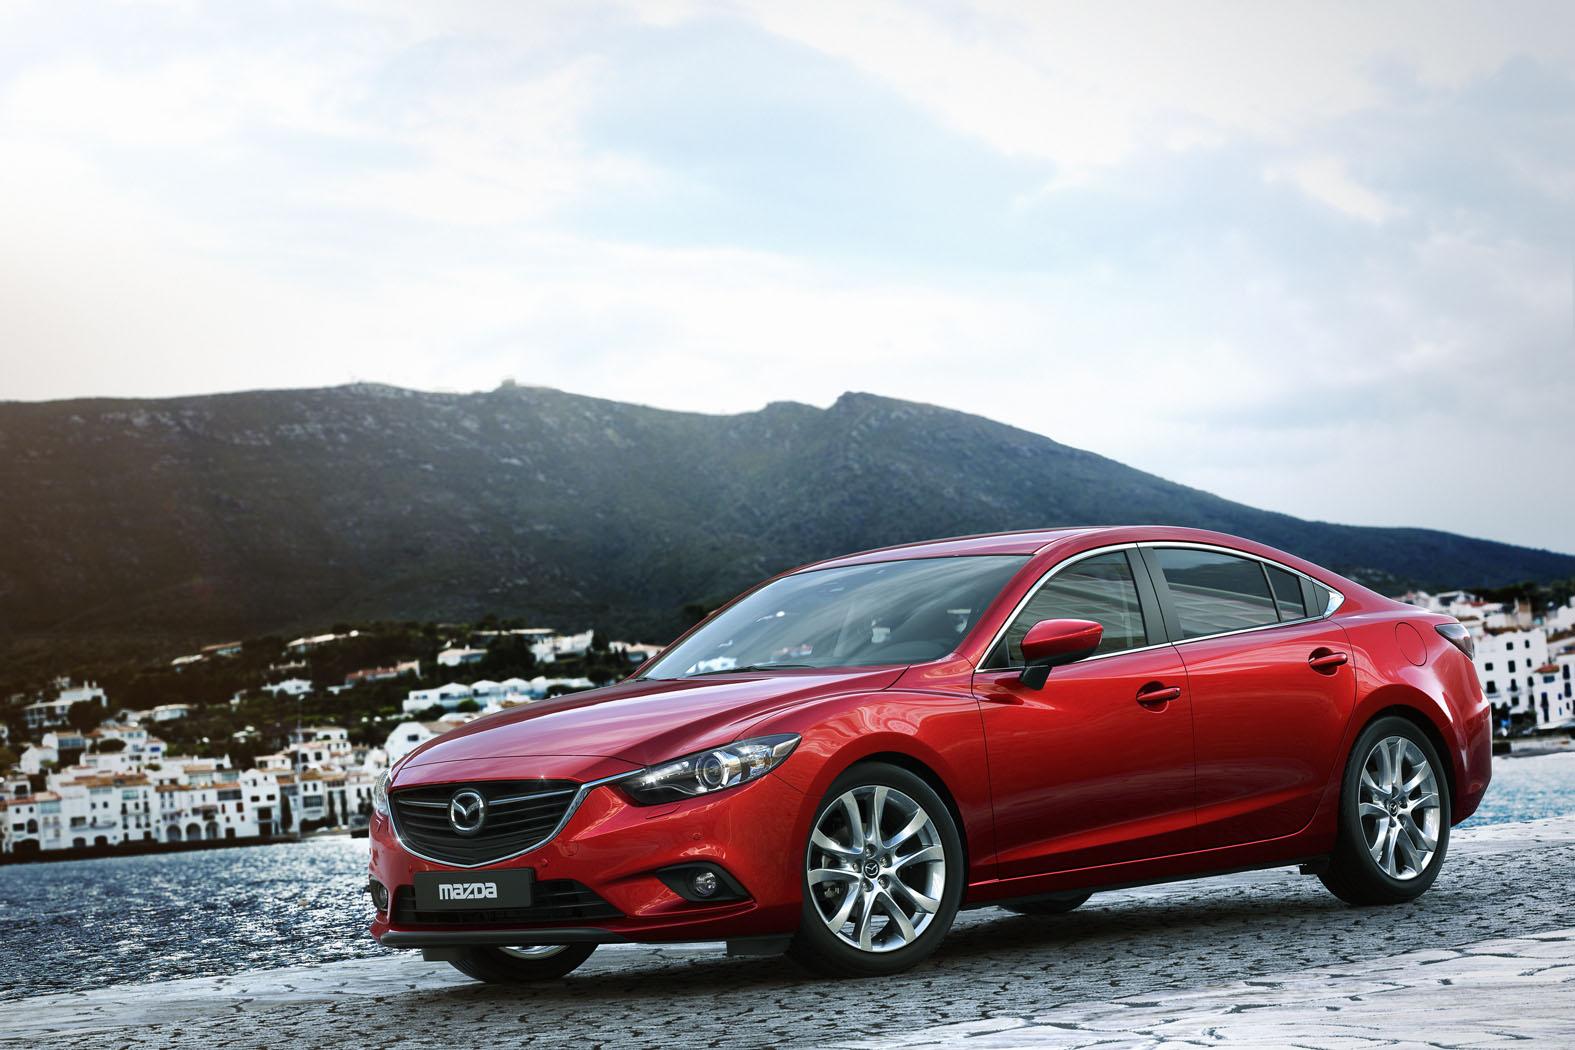 Kelebihan Kekurangan Mazda 6 Review